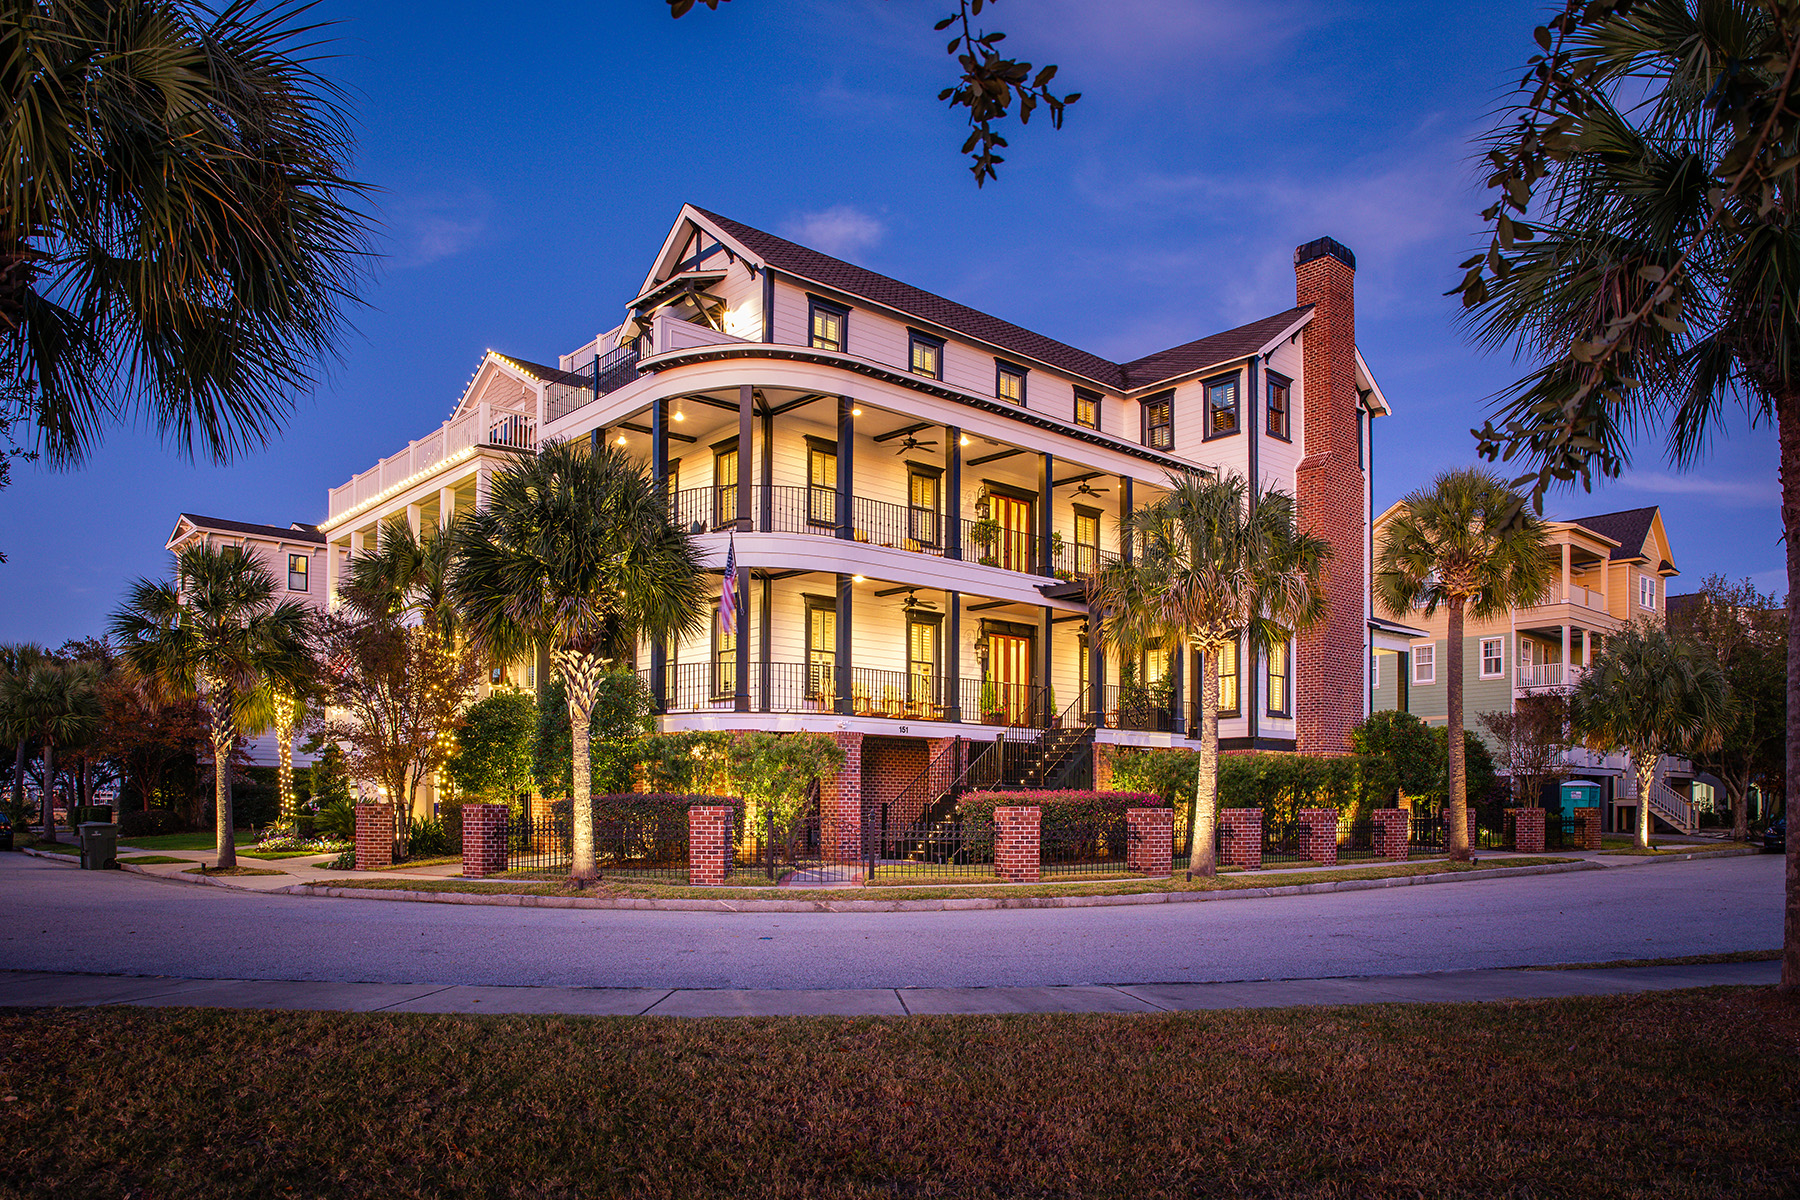 Single Family Homes for Active at 151 Mary Ellen Drive Charleston, South Carolina 29403 United States